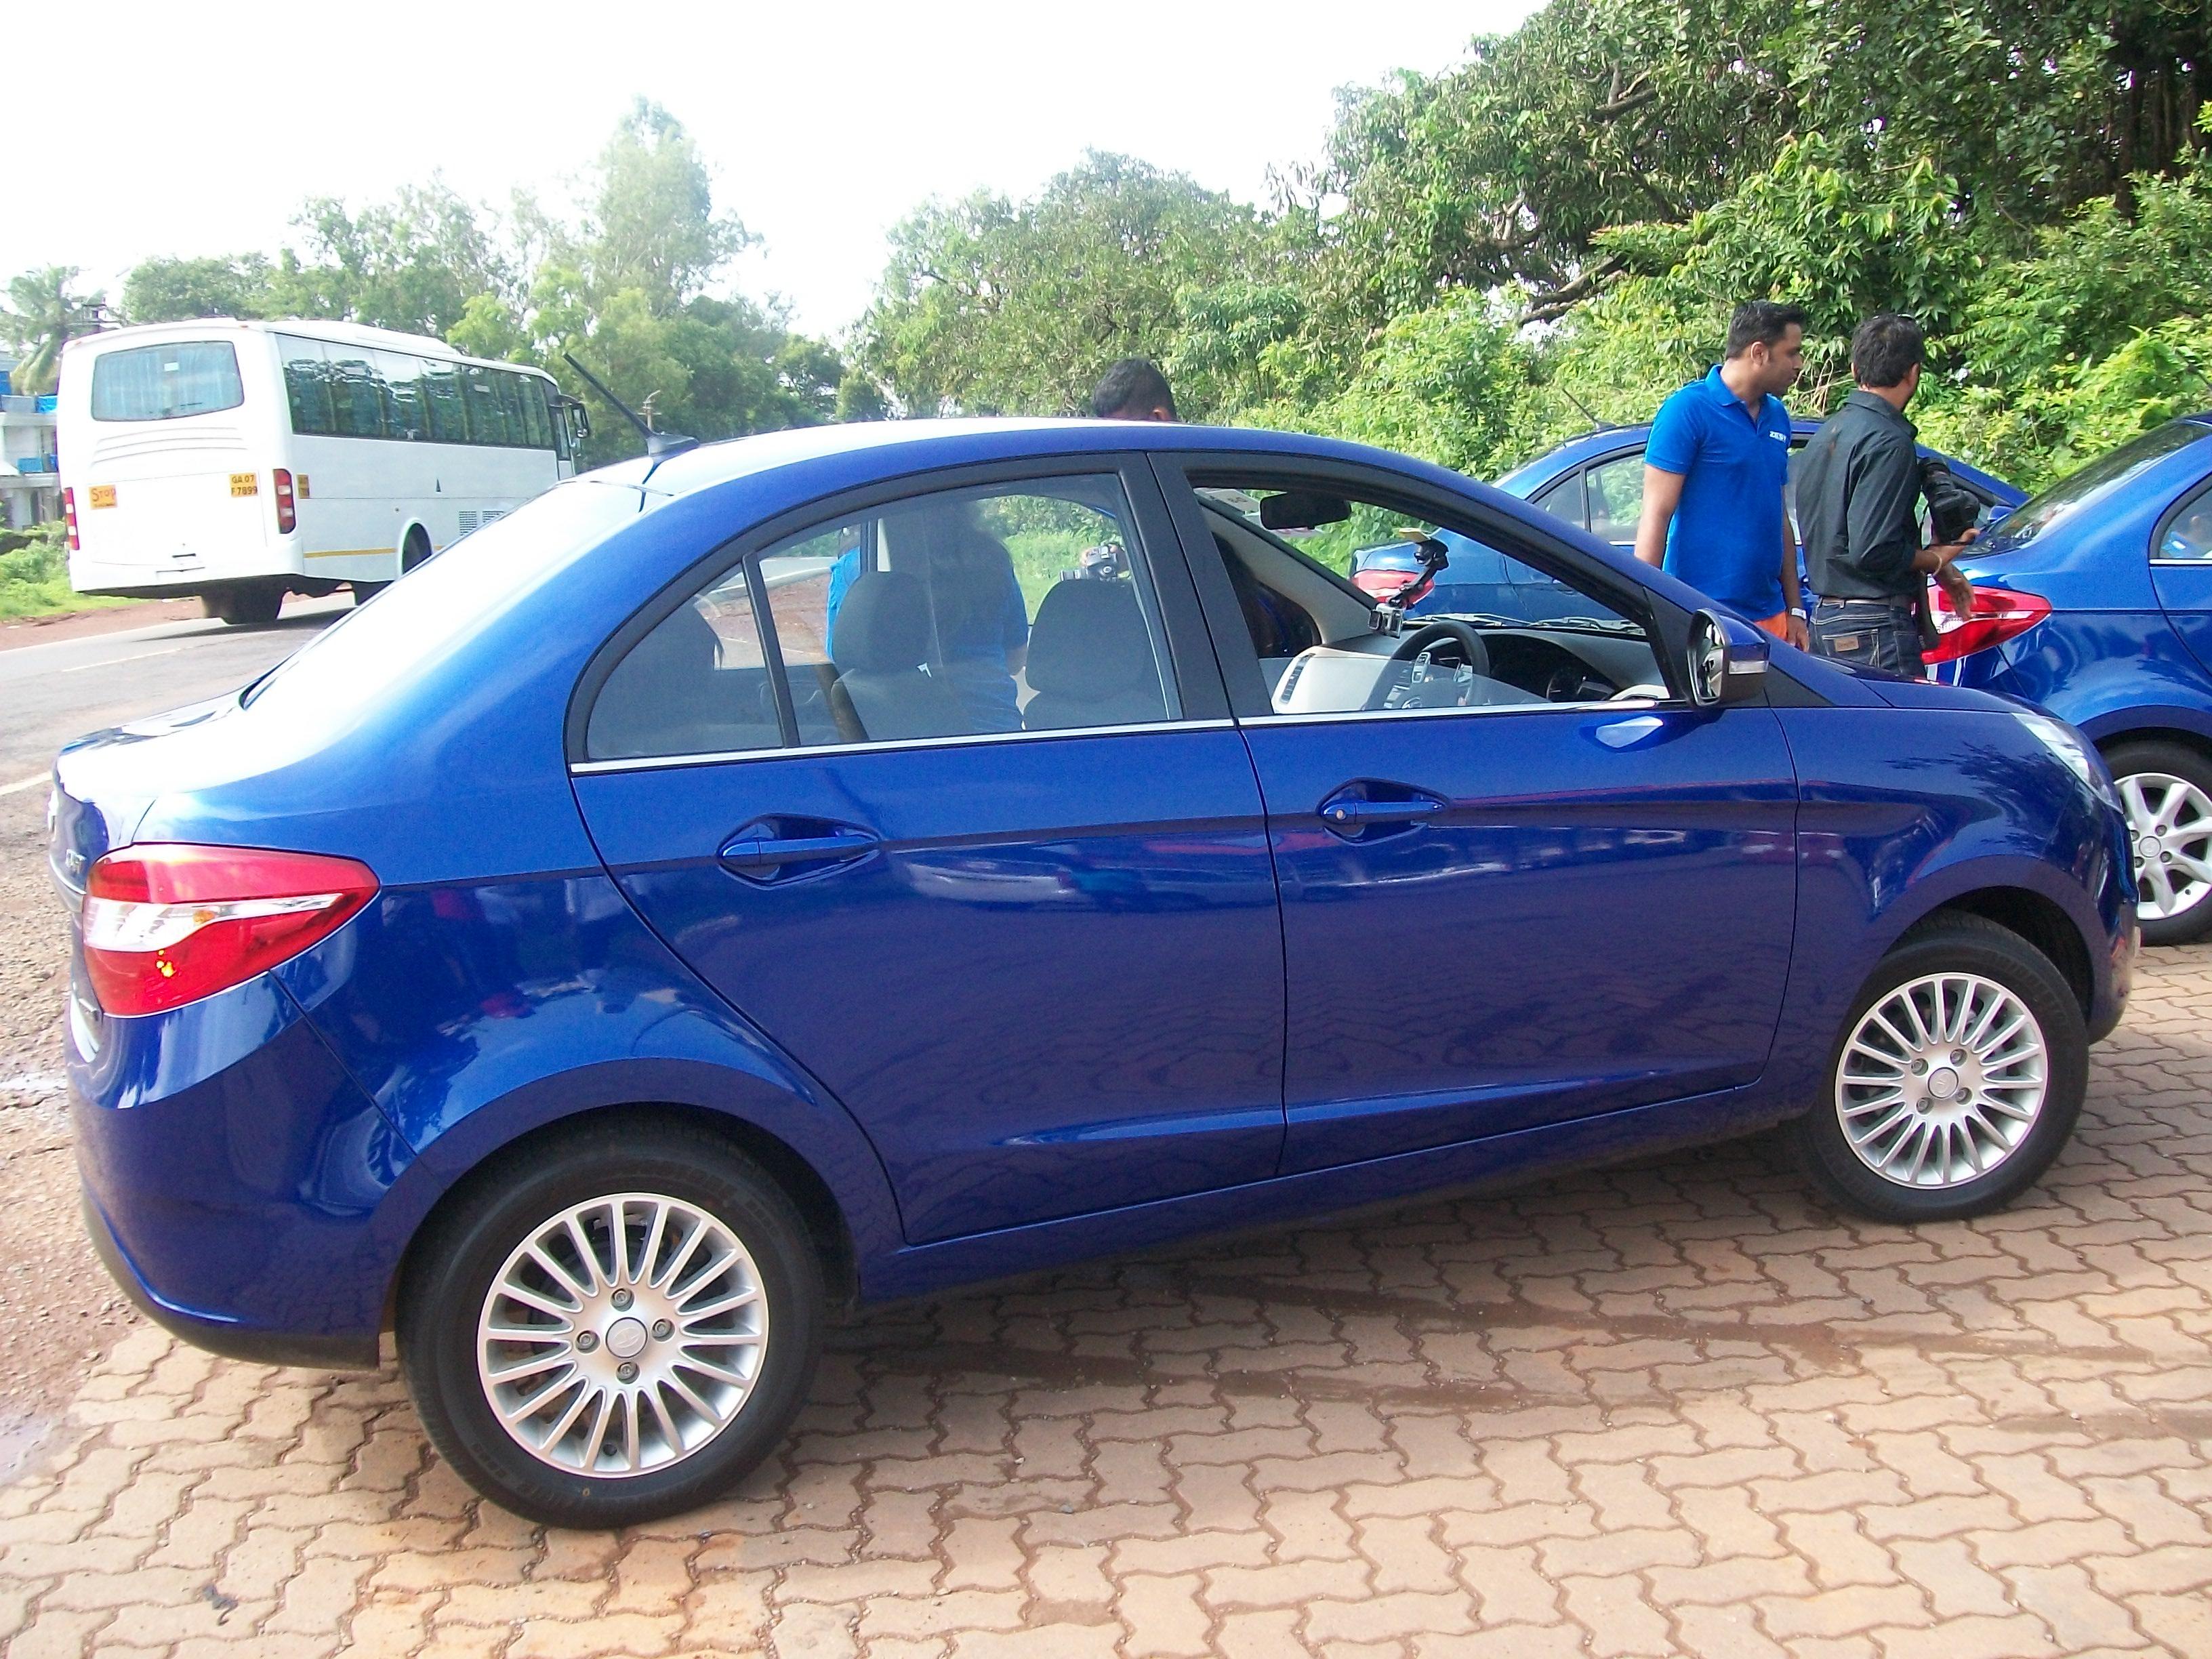 Tata Zest Car The Common Man Speaks